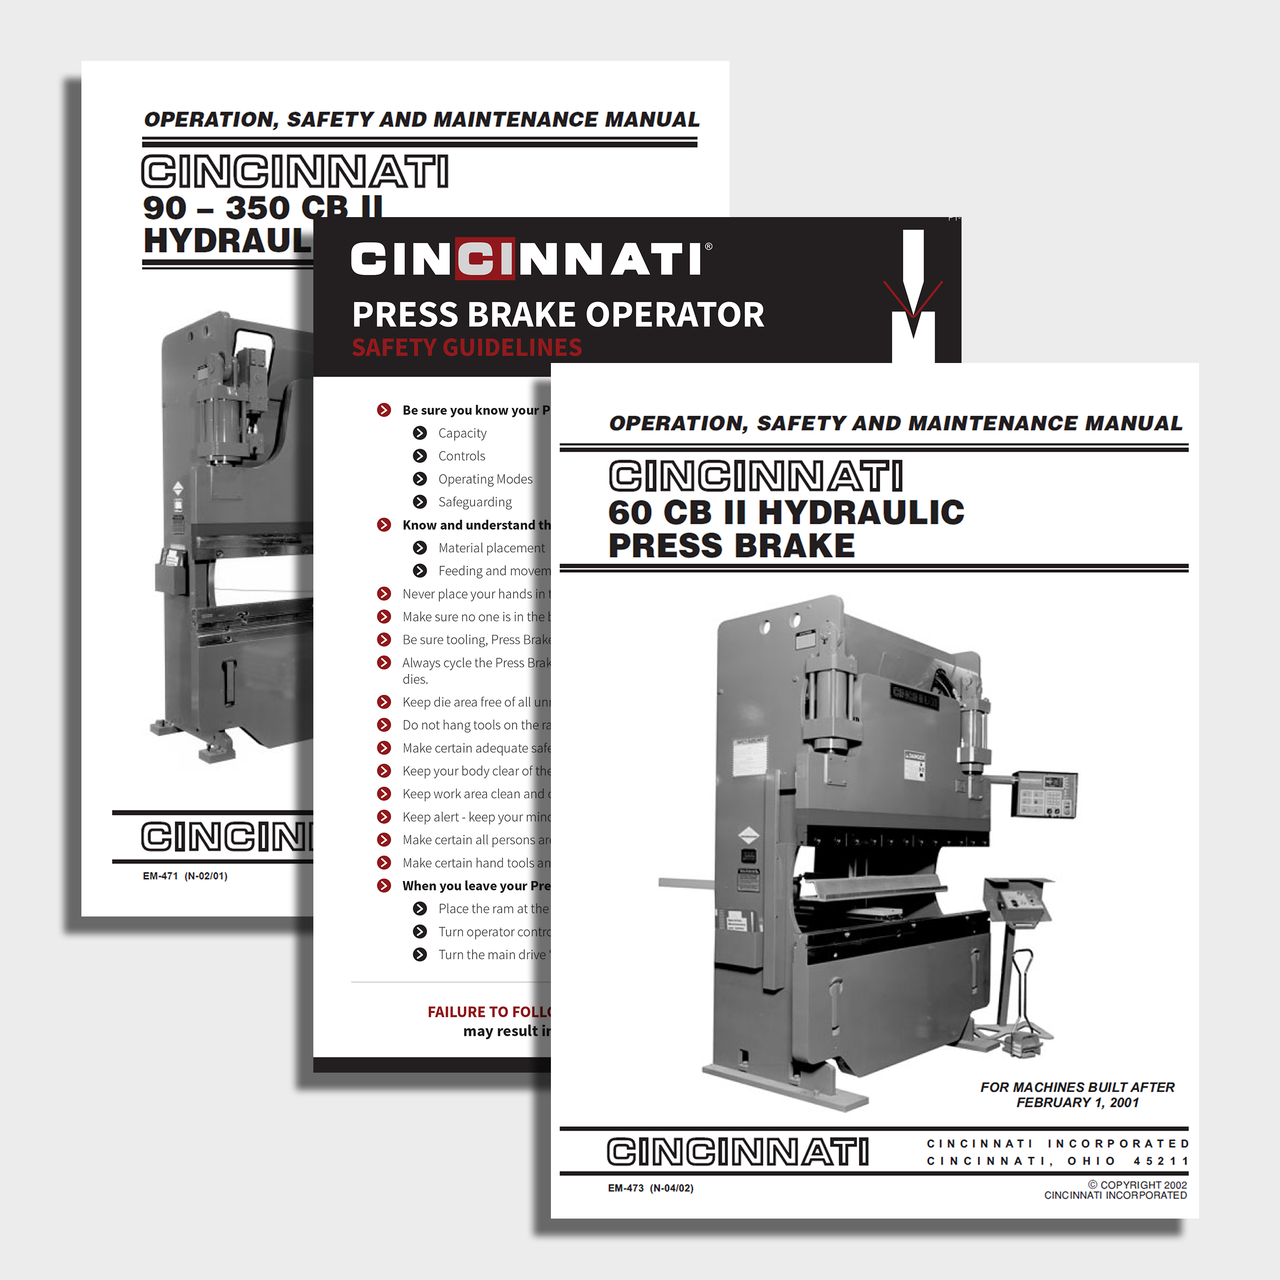 cb ii cnc press brake manual bundle cincinnati incorporated rh ci online e ci com Cincinnati MaxForm Press Brake Cincinnati Press Brake Repair